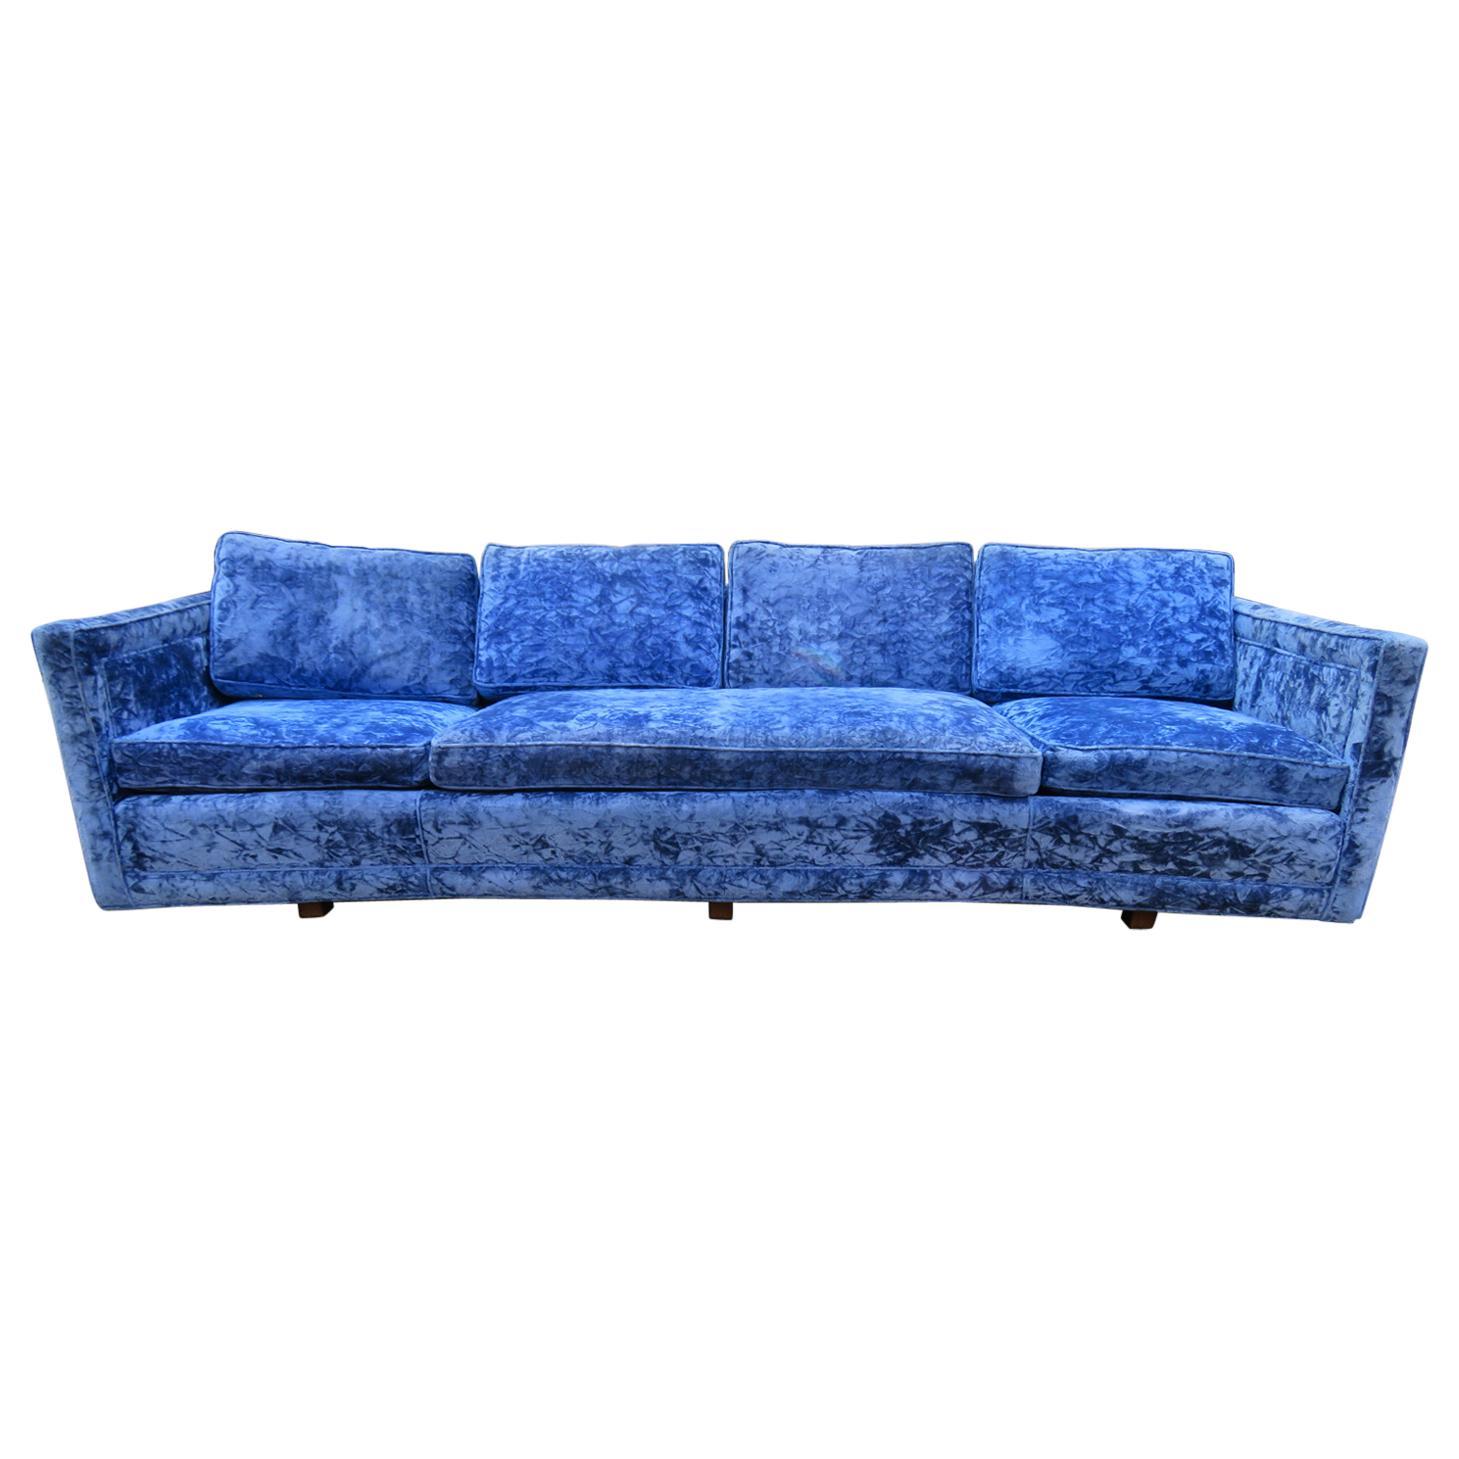 Stunning Curved Erwin Lambeth Sled Leg Sofa Mid-Century Modern